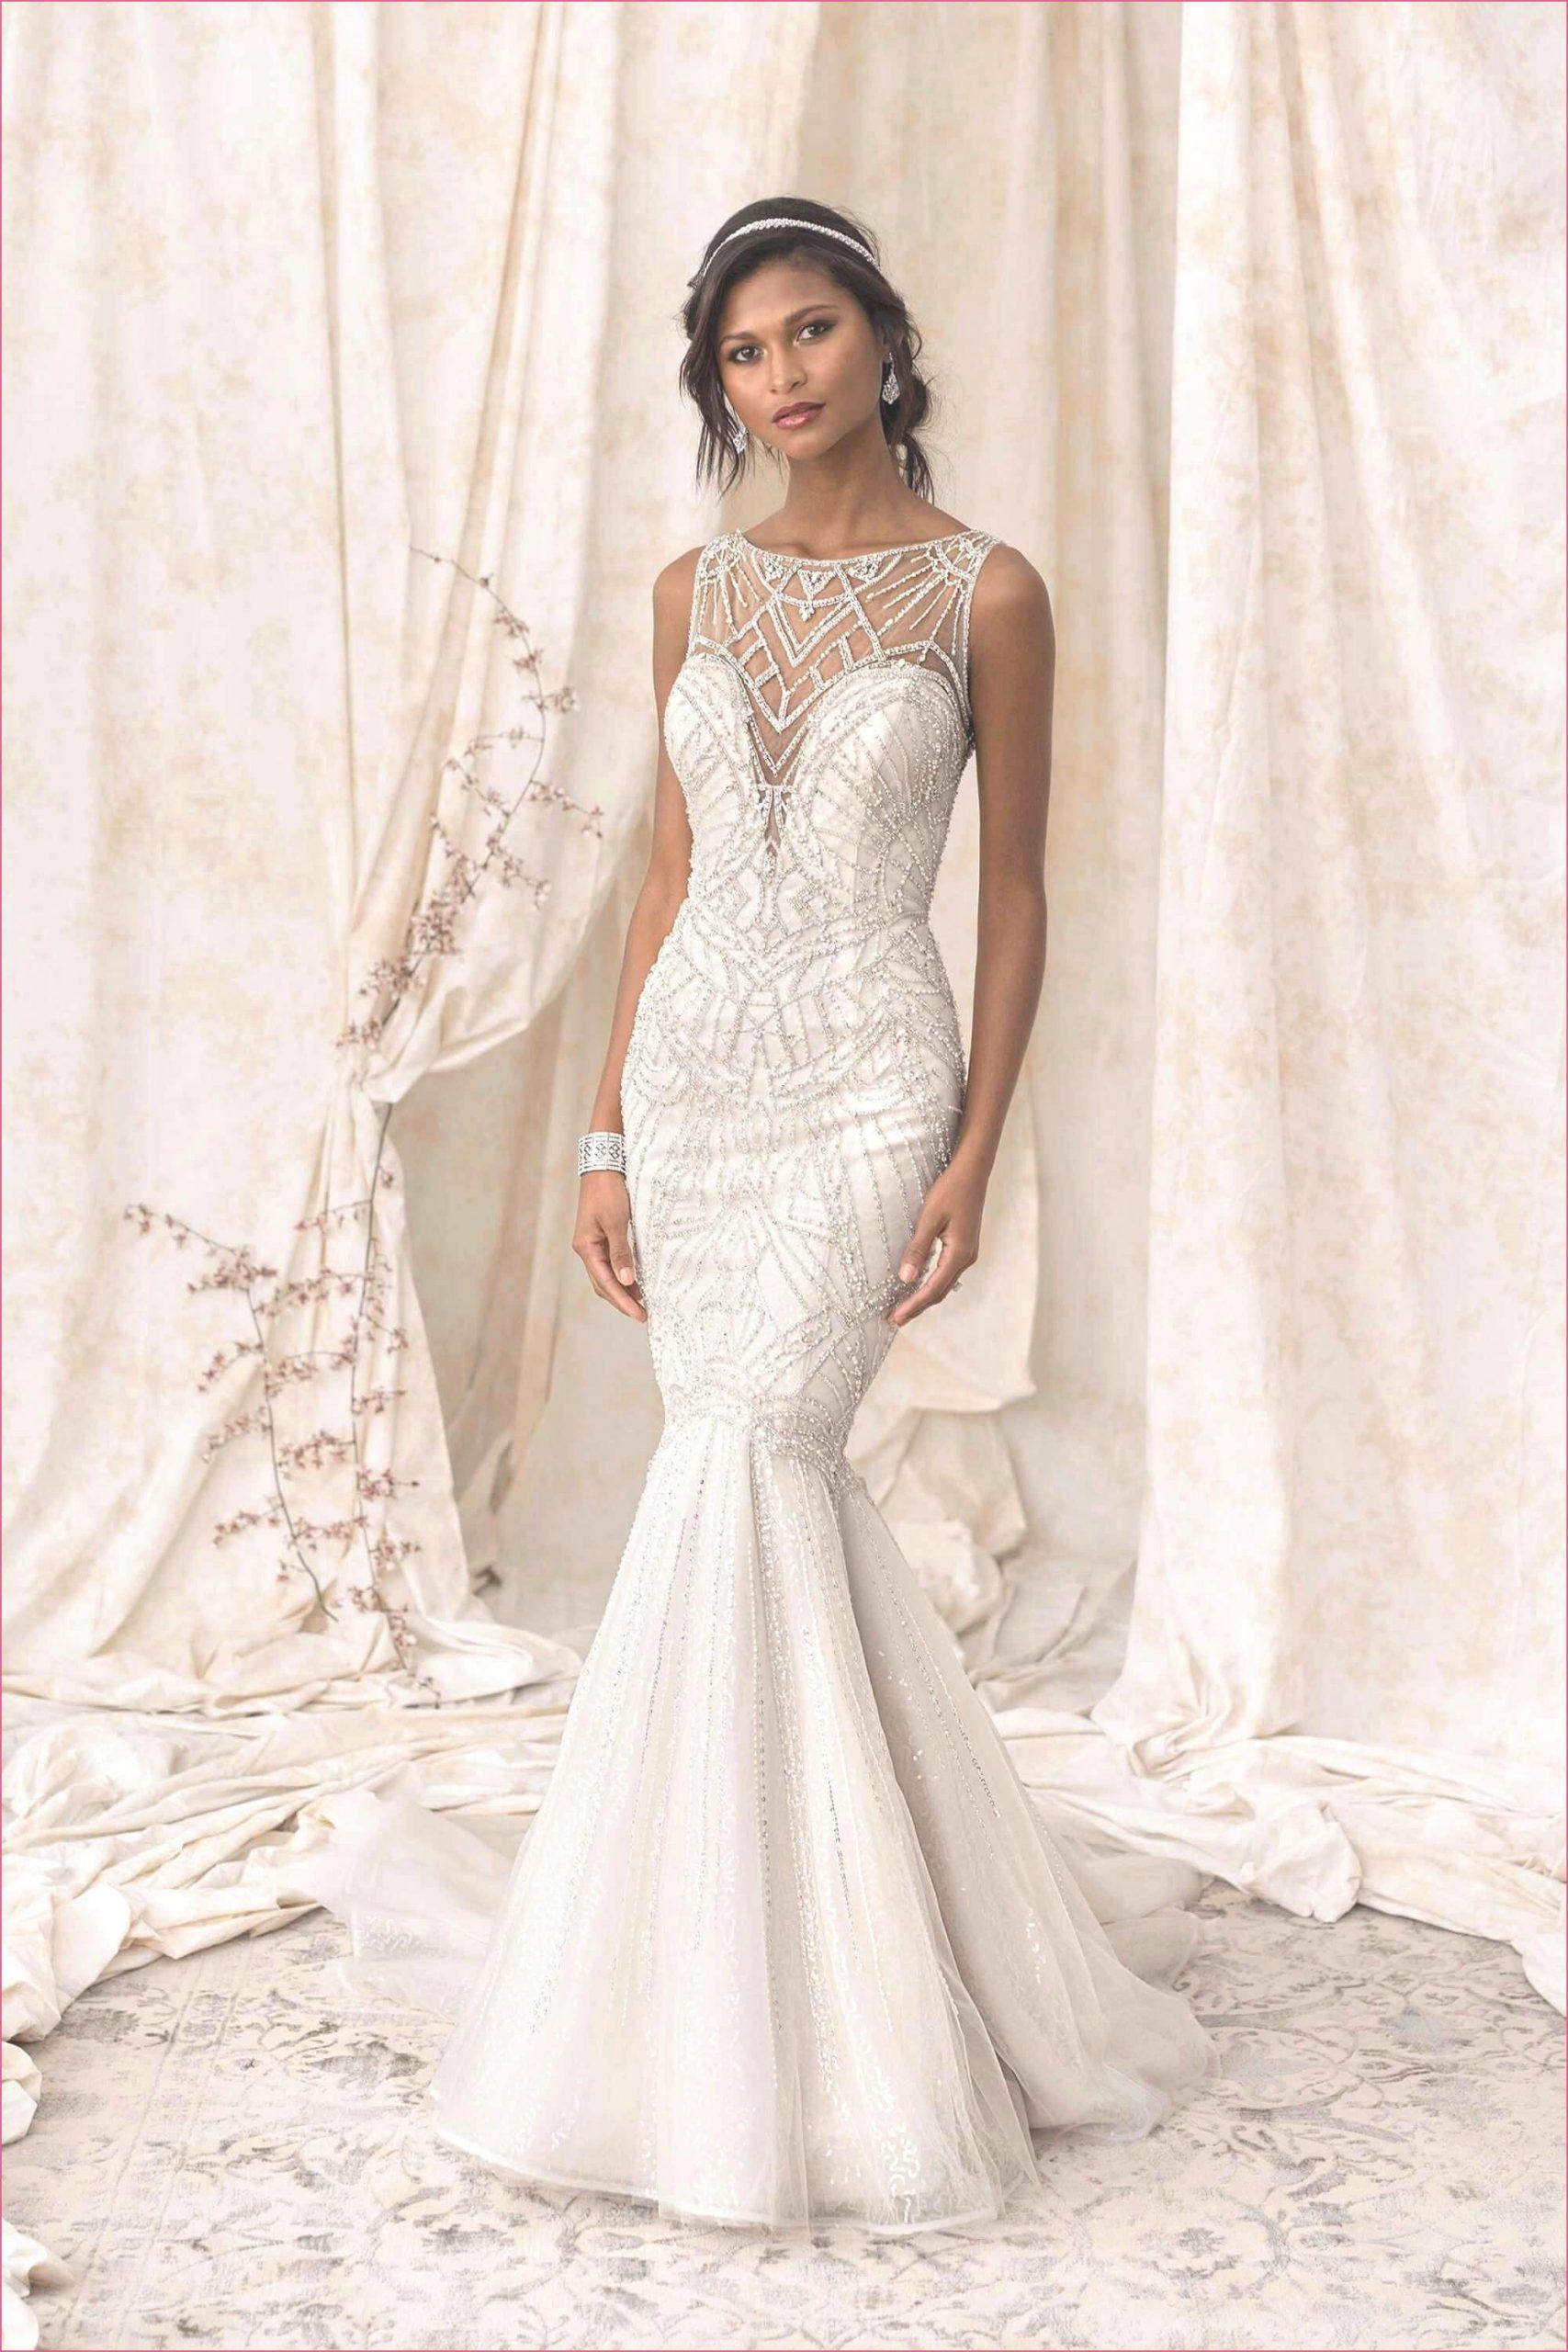 10 Elegant Abendkleid 44 Lang GalerieDesigner Leicht Abendkleid 44 Lang Boutique